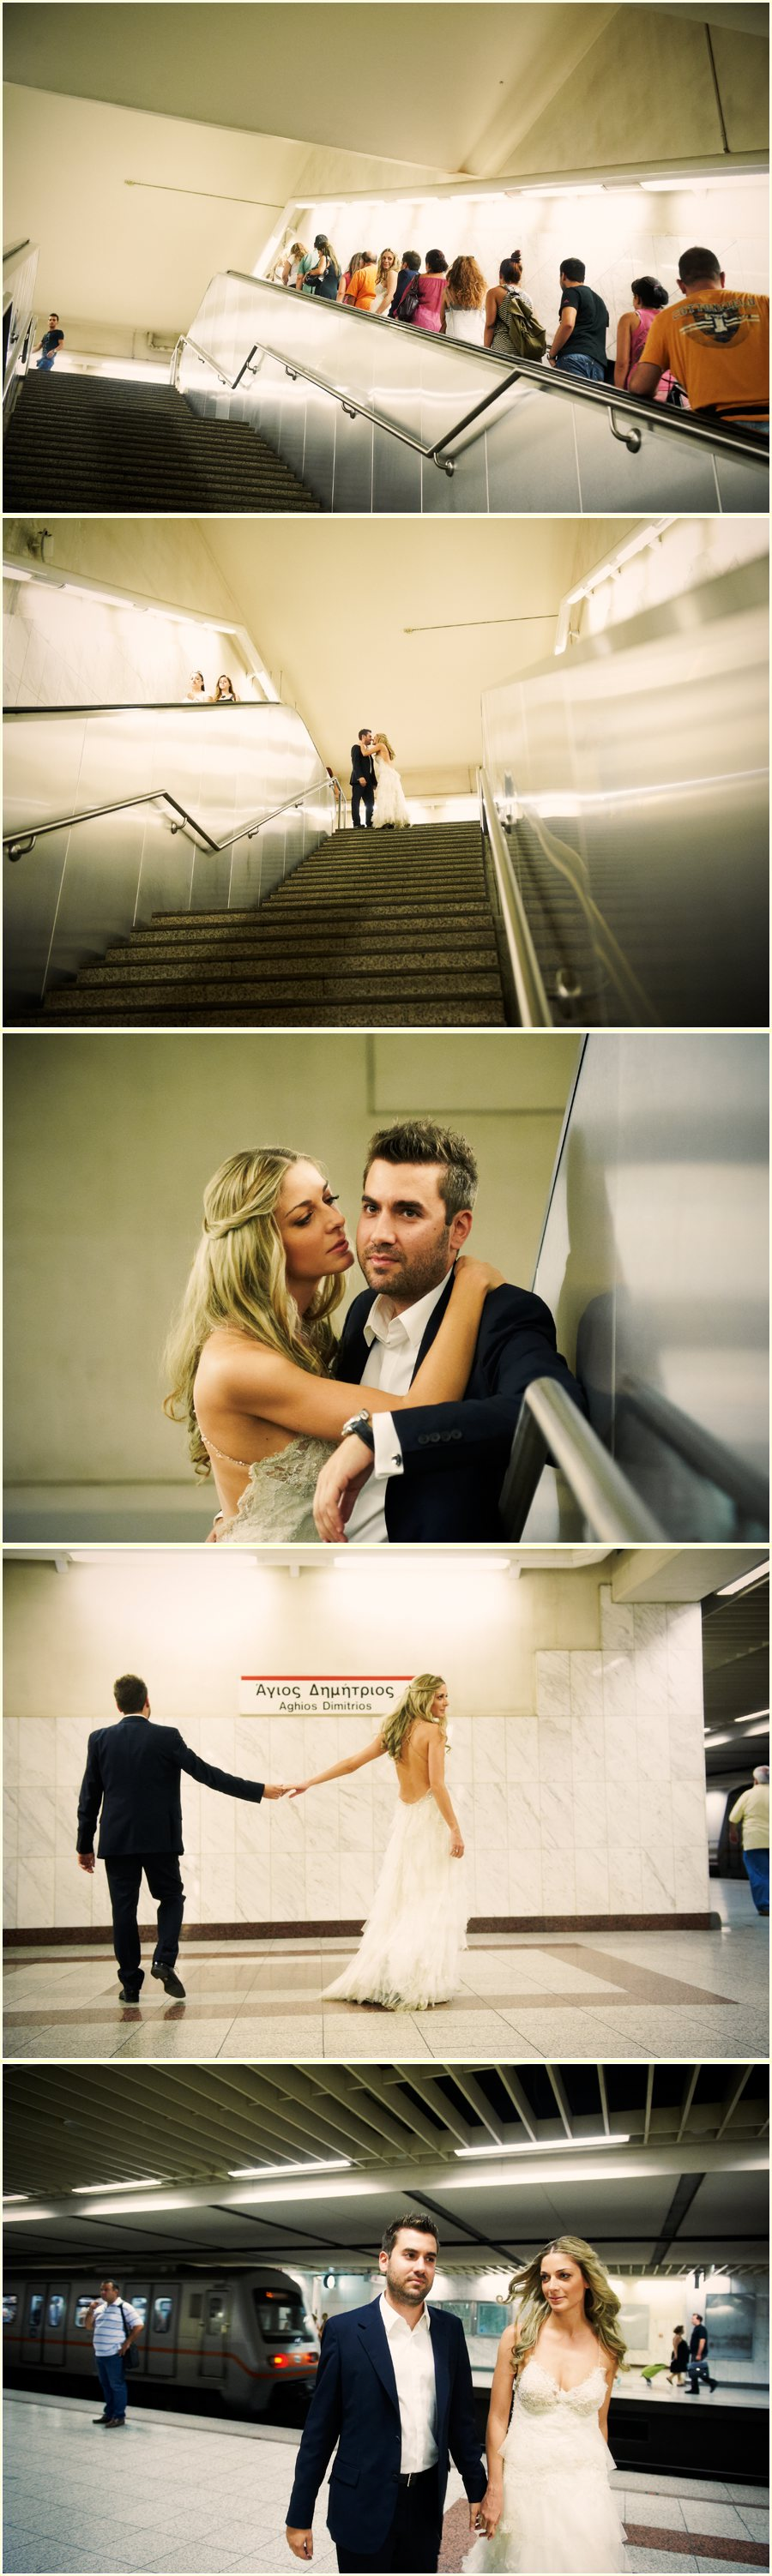 818e4908fb3d Η πιο όμορφη νύφη που έχω συναντήσει και μιλάω για την απίστευτη εσωτερική  ομορφιά της Πένυ που διαχέεται προς τα έξω με τα μεγάλα εκφραστικά της μάτια .